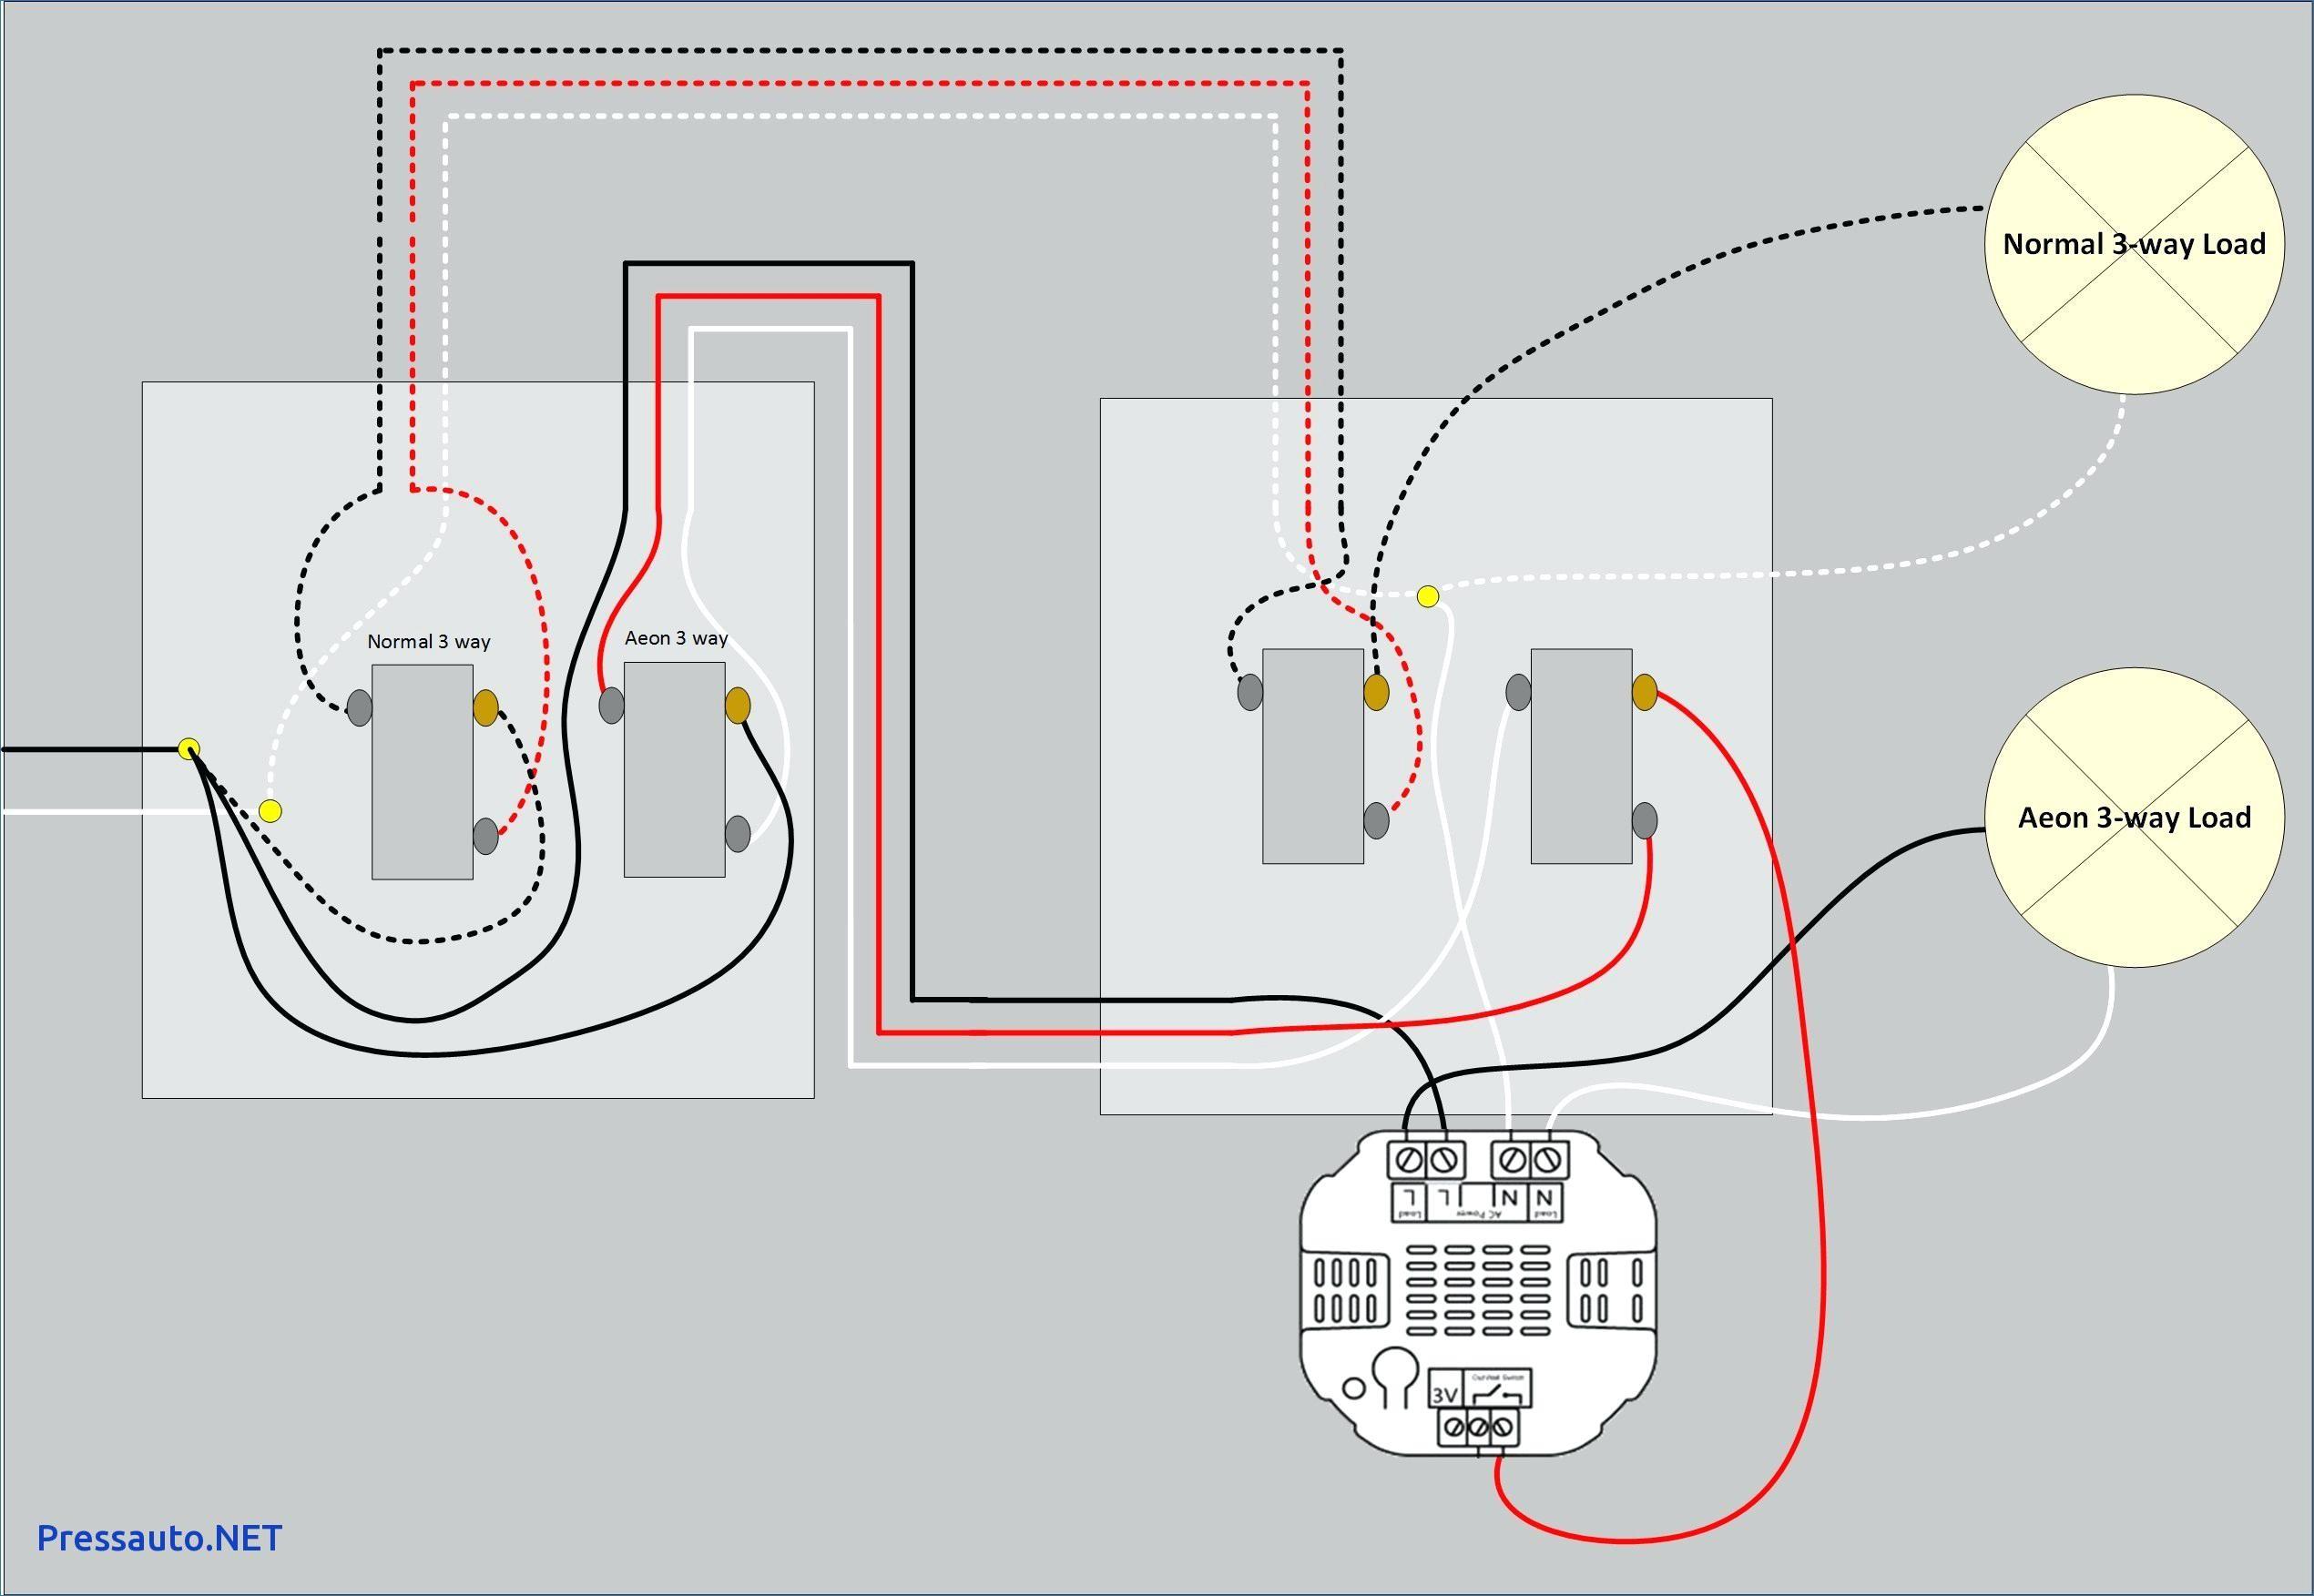 Lr 9614 Wiring Diagram Australia Wiring Double Light Switch Diagram Two Pole